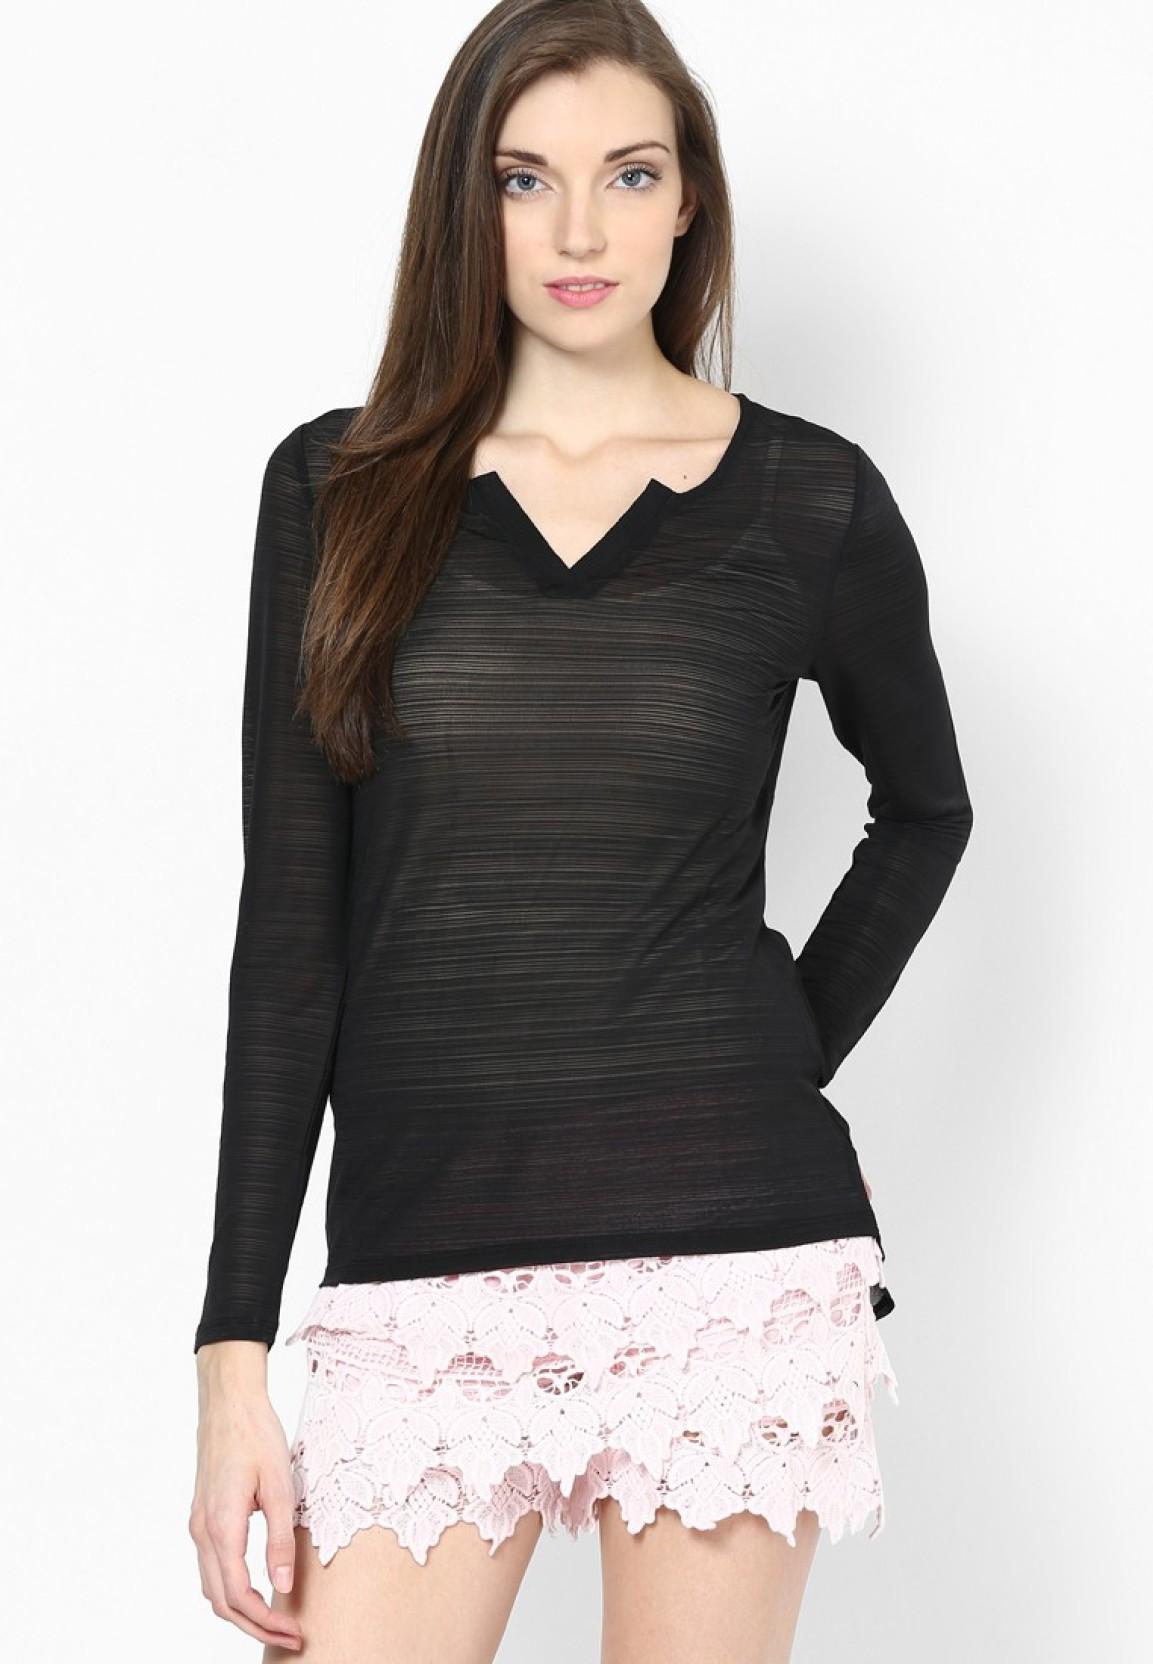 ddd887bcf5221 Vero Moda Solid Women s V-neck Black T-Shirt - Buy Black Vero Moda ...